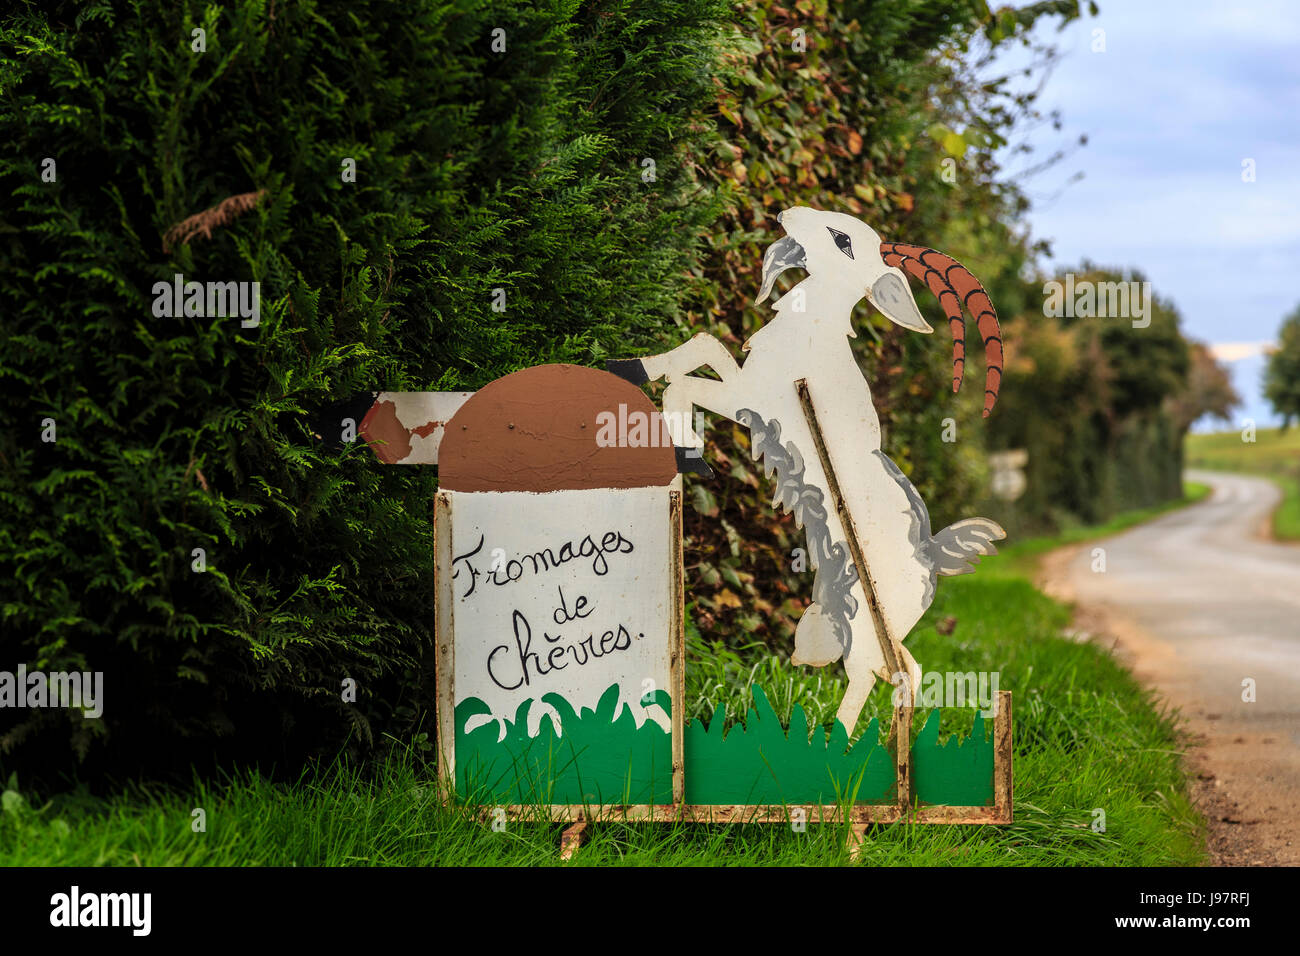 France, Cher, Menetou-Ratel, chevrerie or goat shed sign - Stock Image